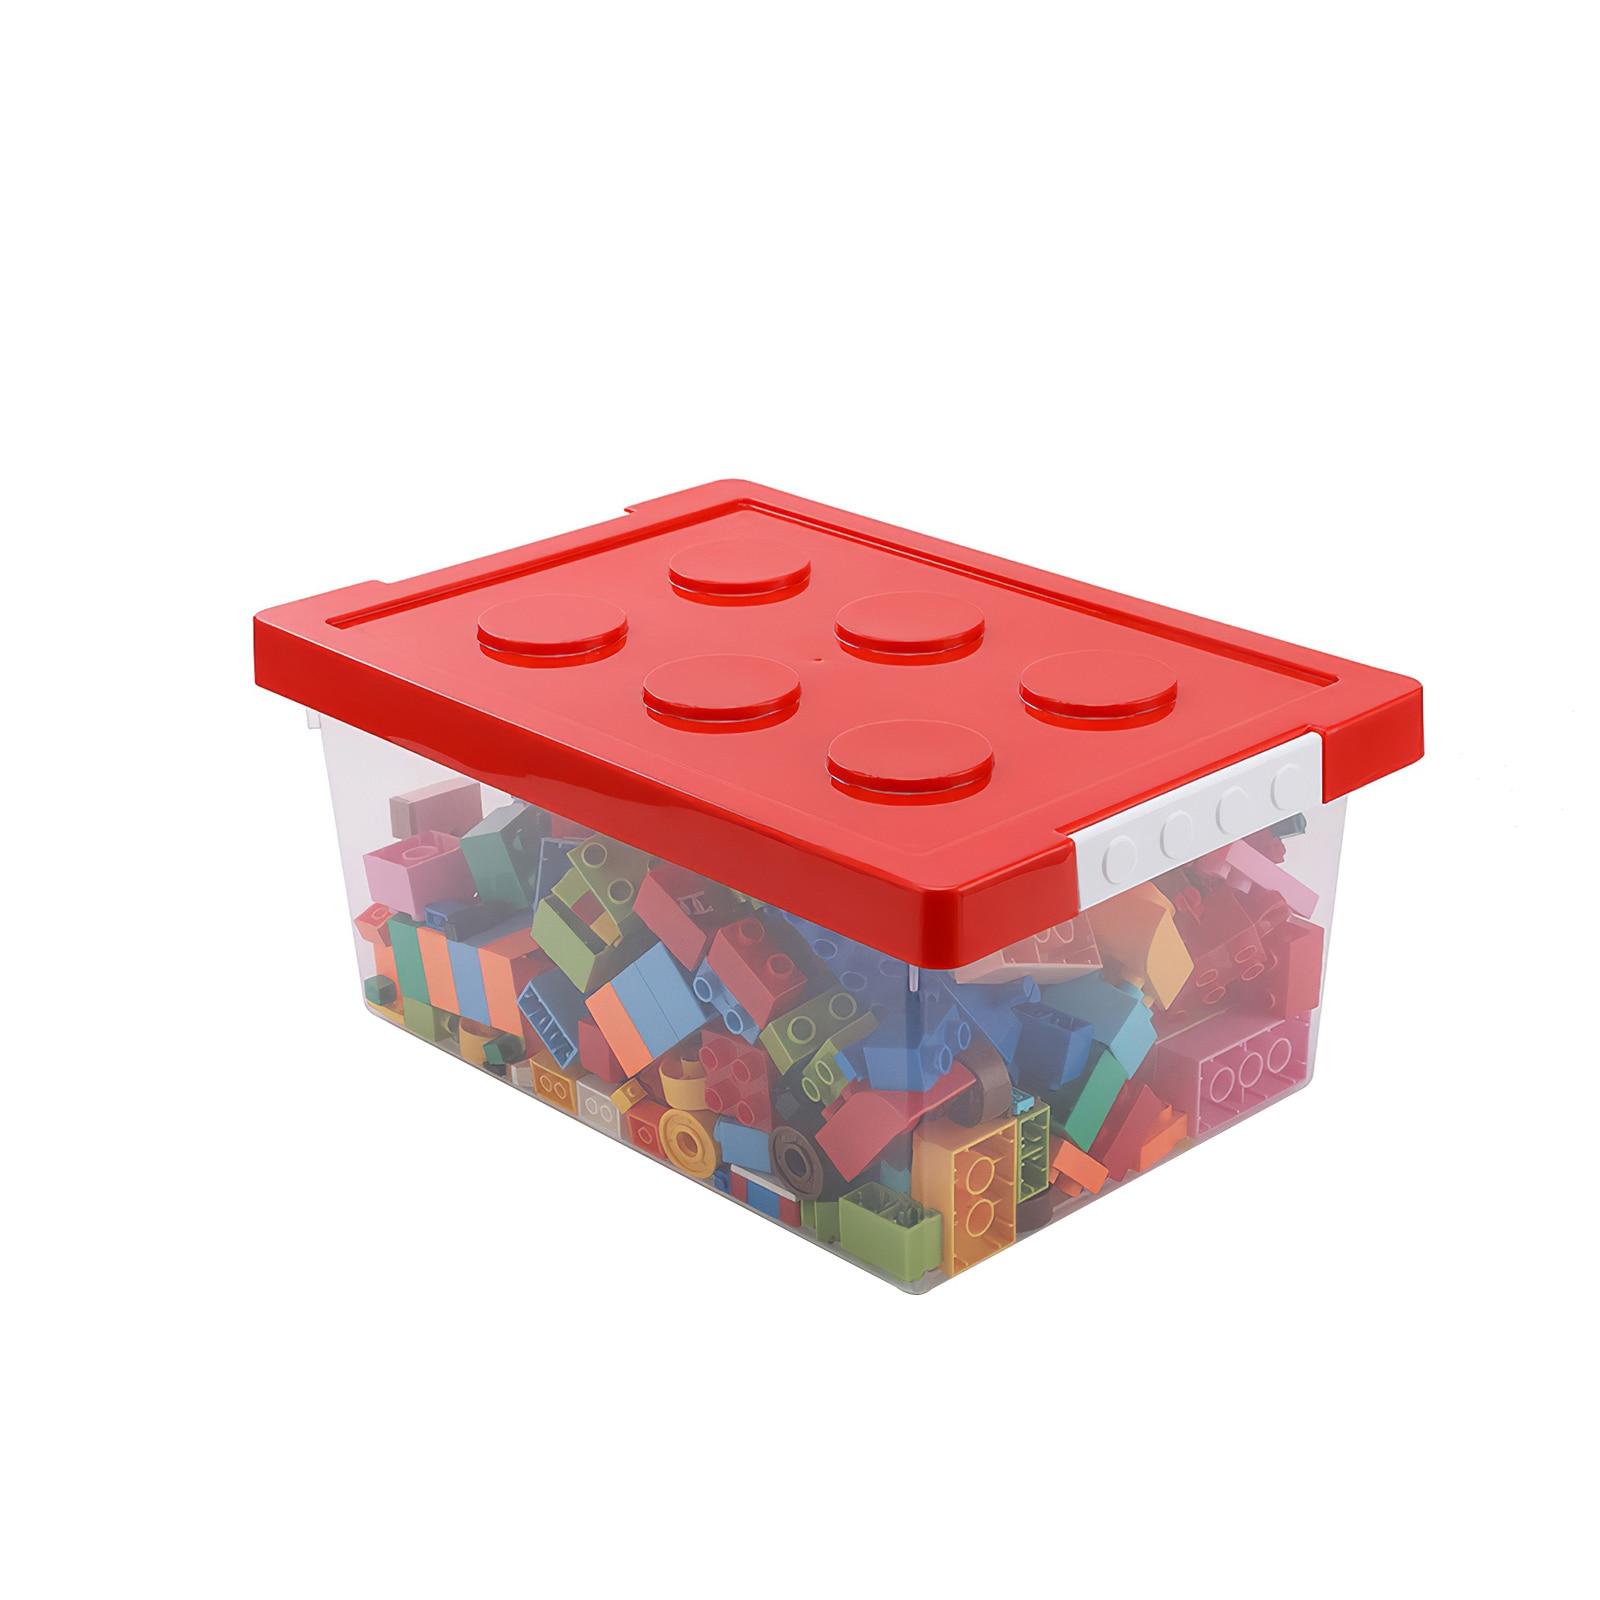 Kids Building Block Storage Box Colorful Stackable Building Block Storage Box Stacking Toys For Children Plastic Container Case